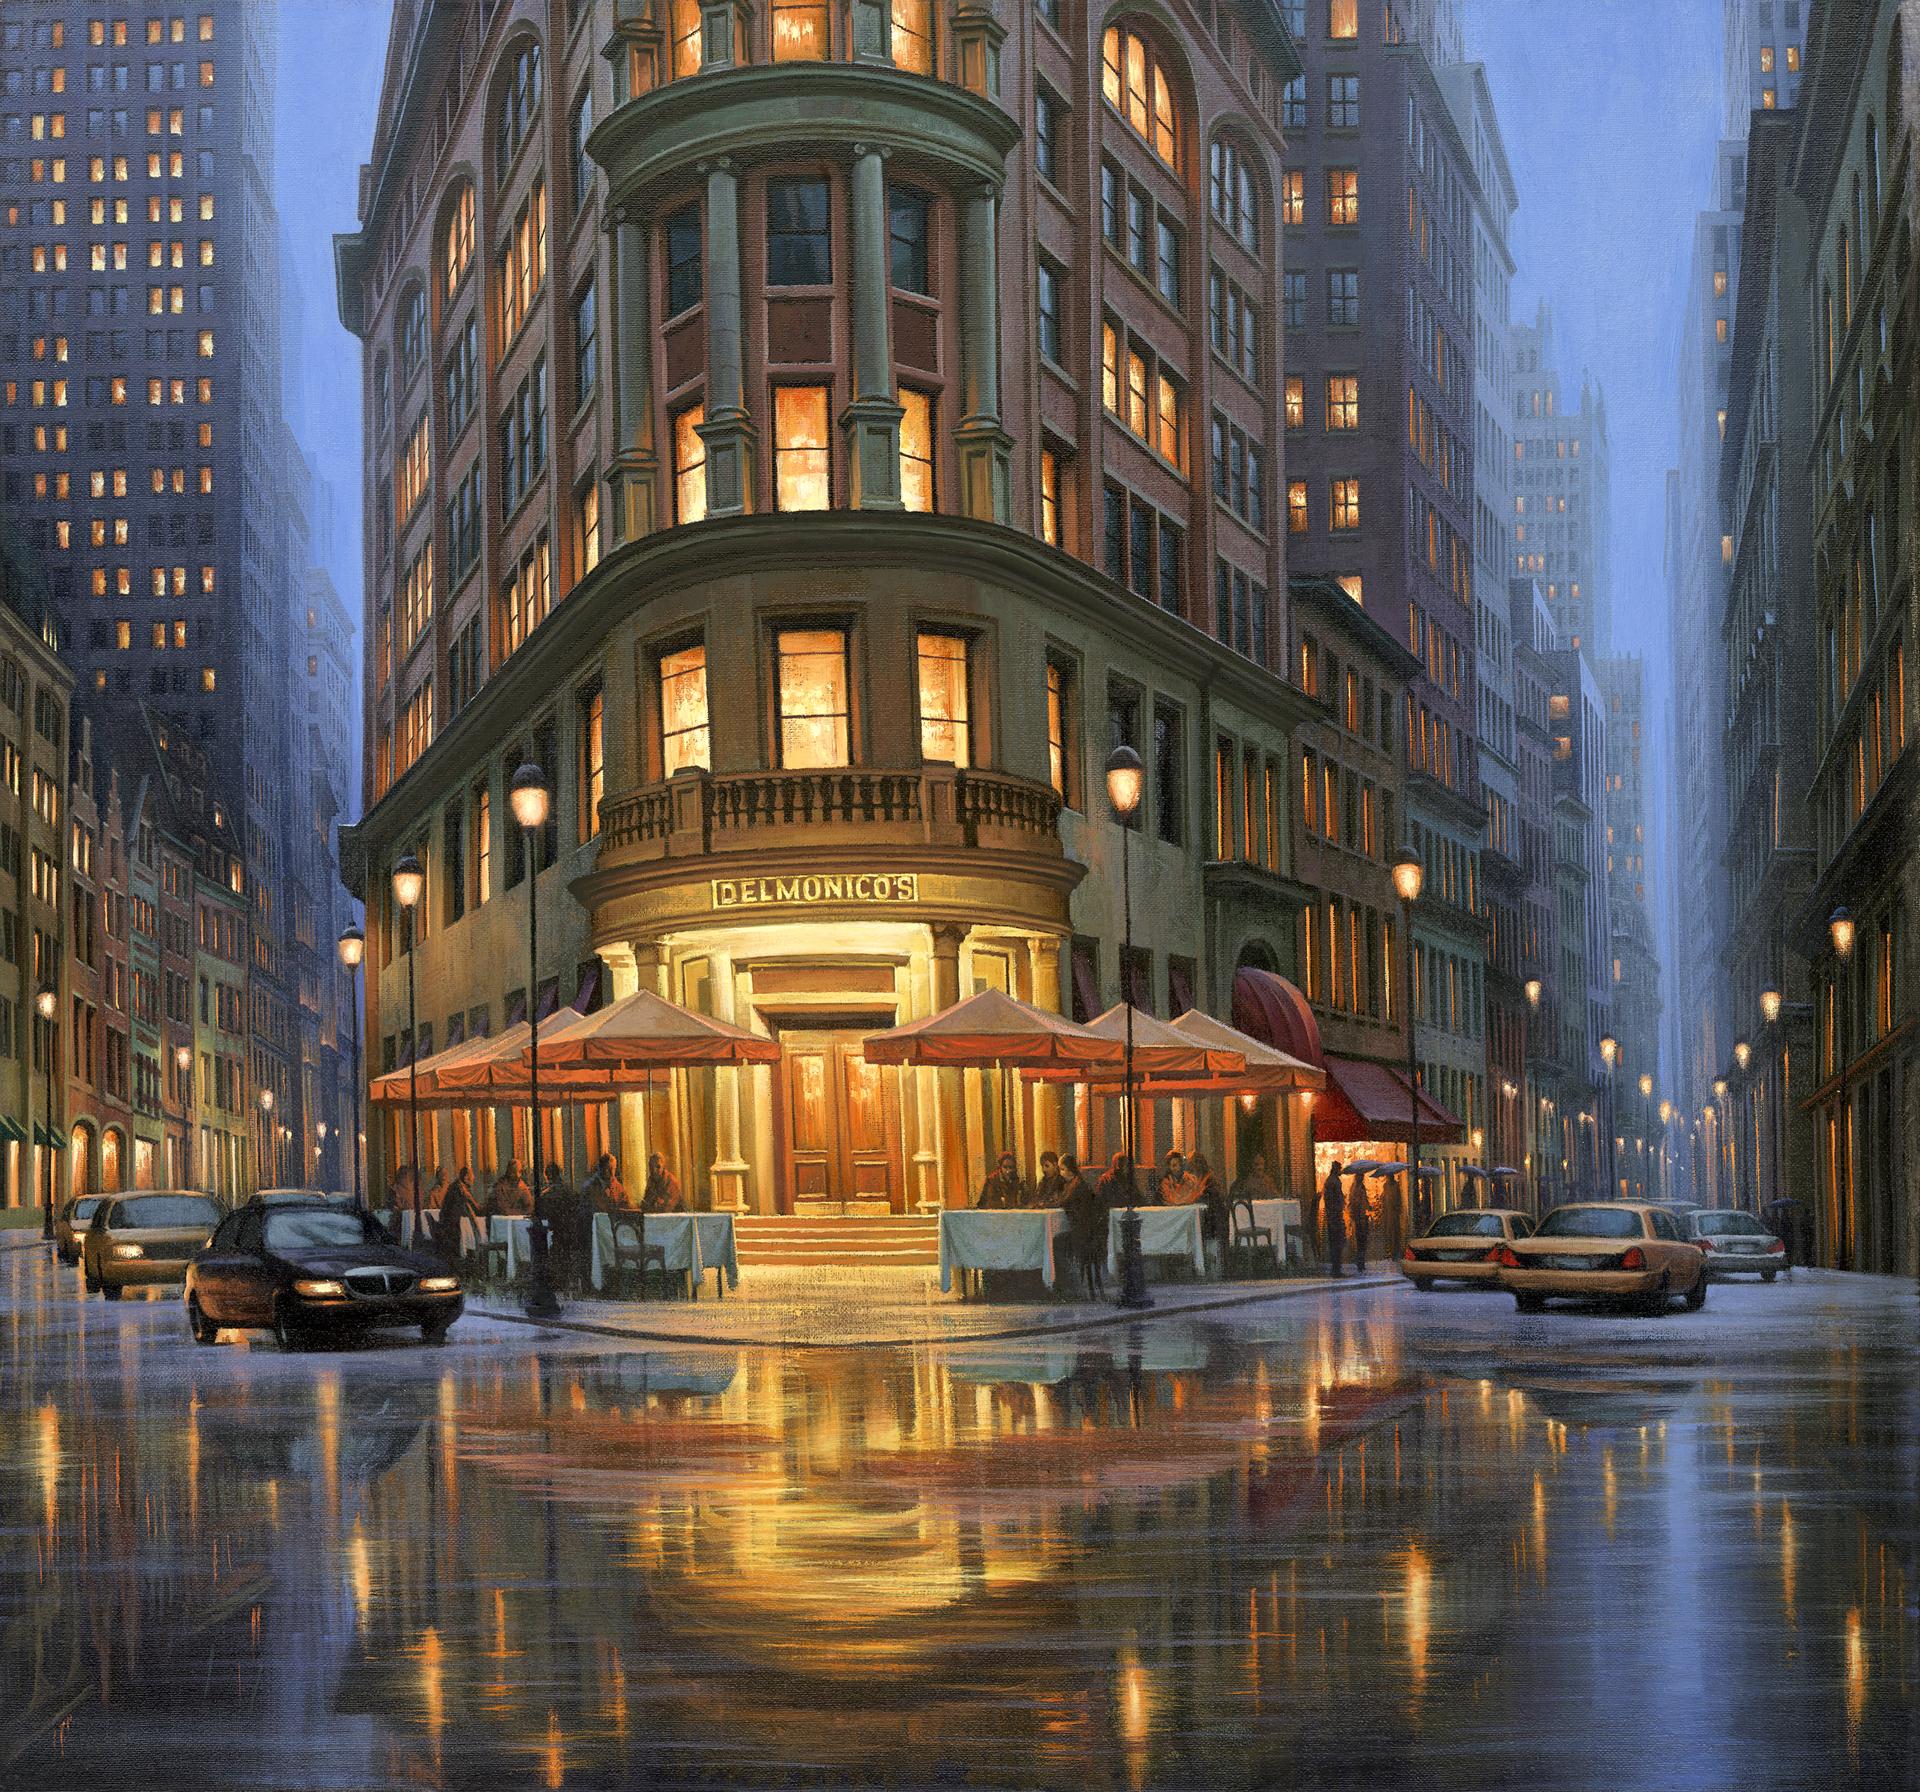 Summer Rain - Delmonico's Gold Series by Alexei Butirskiy